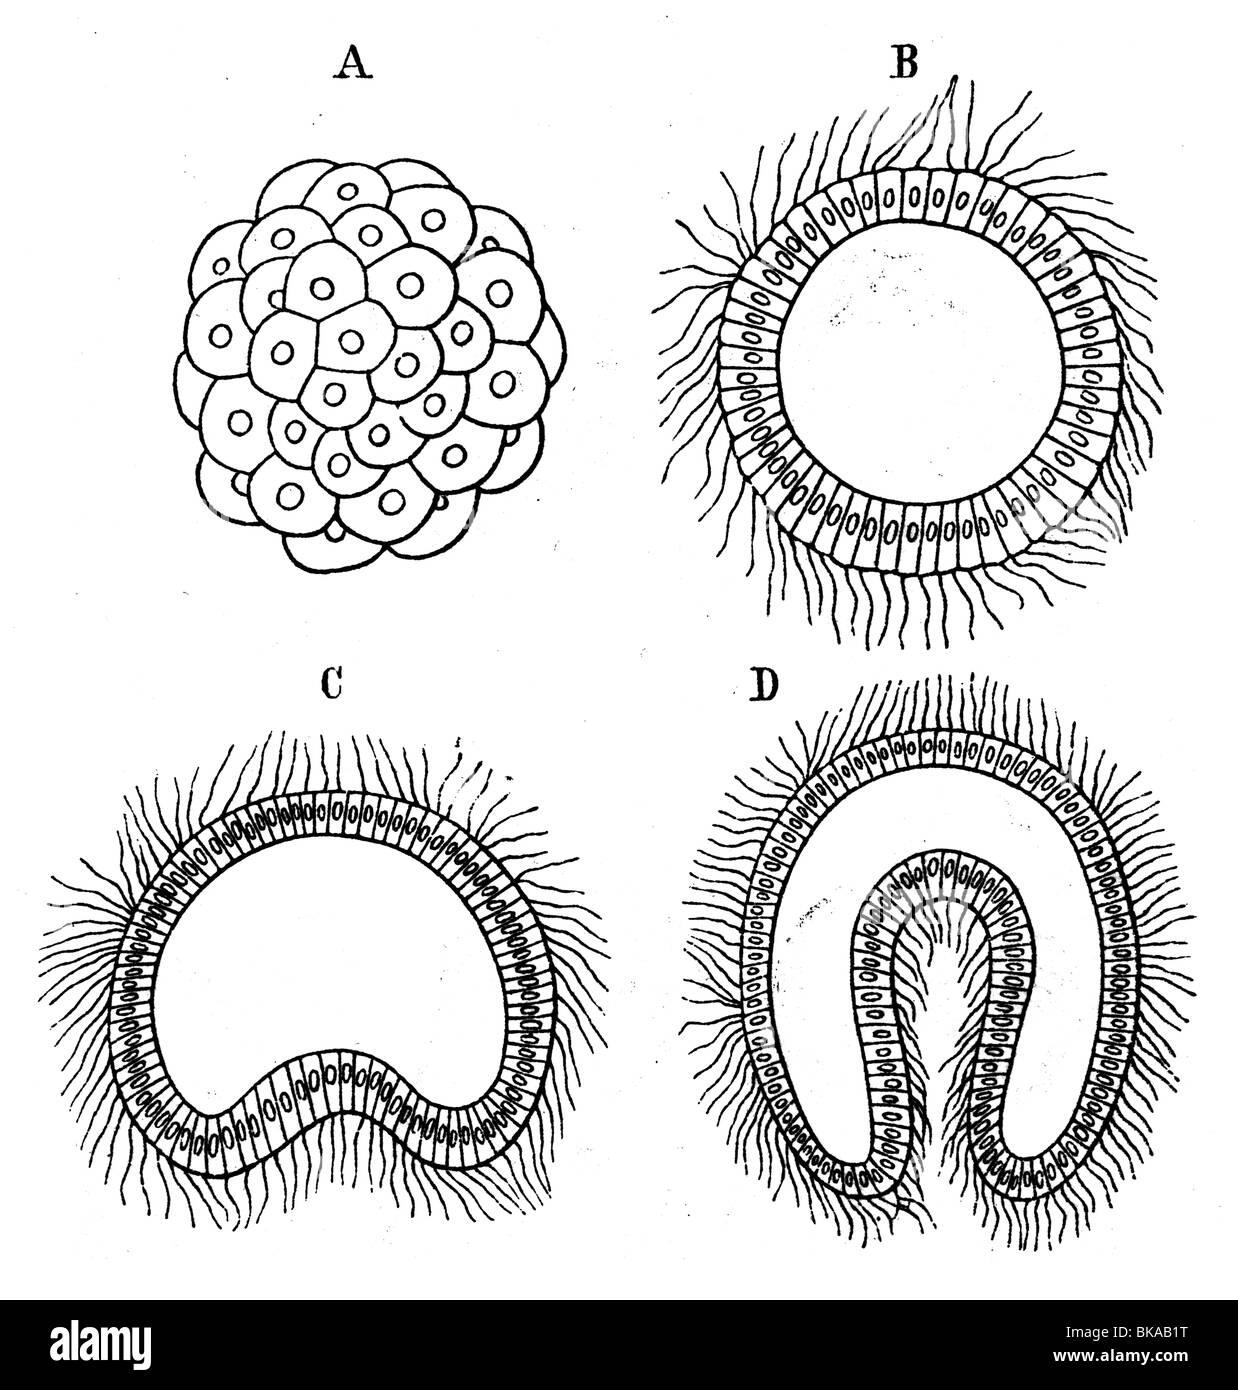 Embryogenese Morula Blastula Gastrula Stockfoto Bild